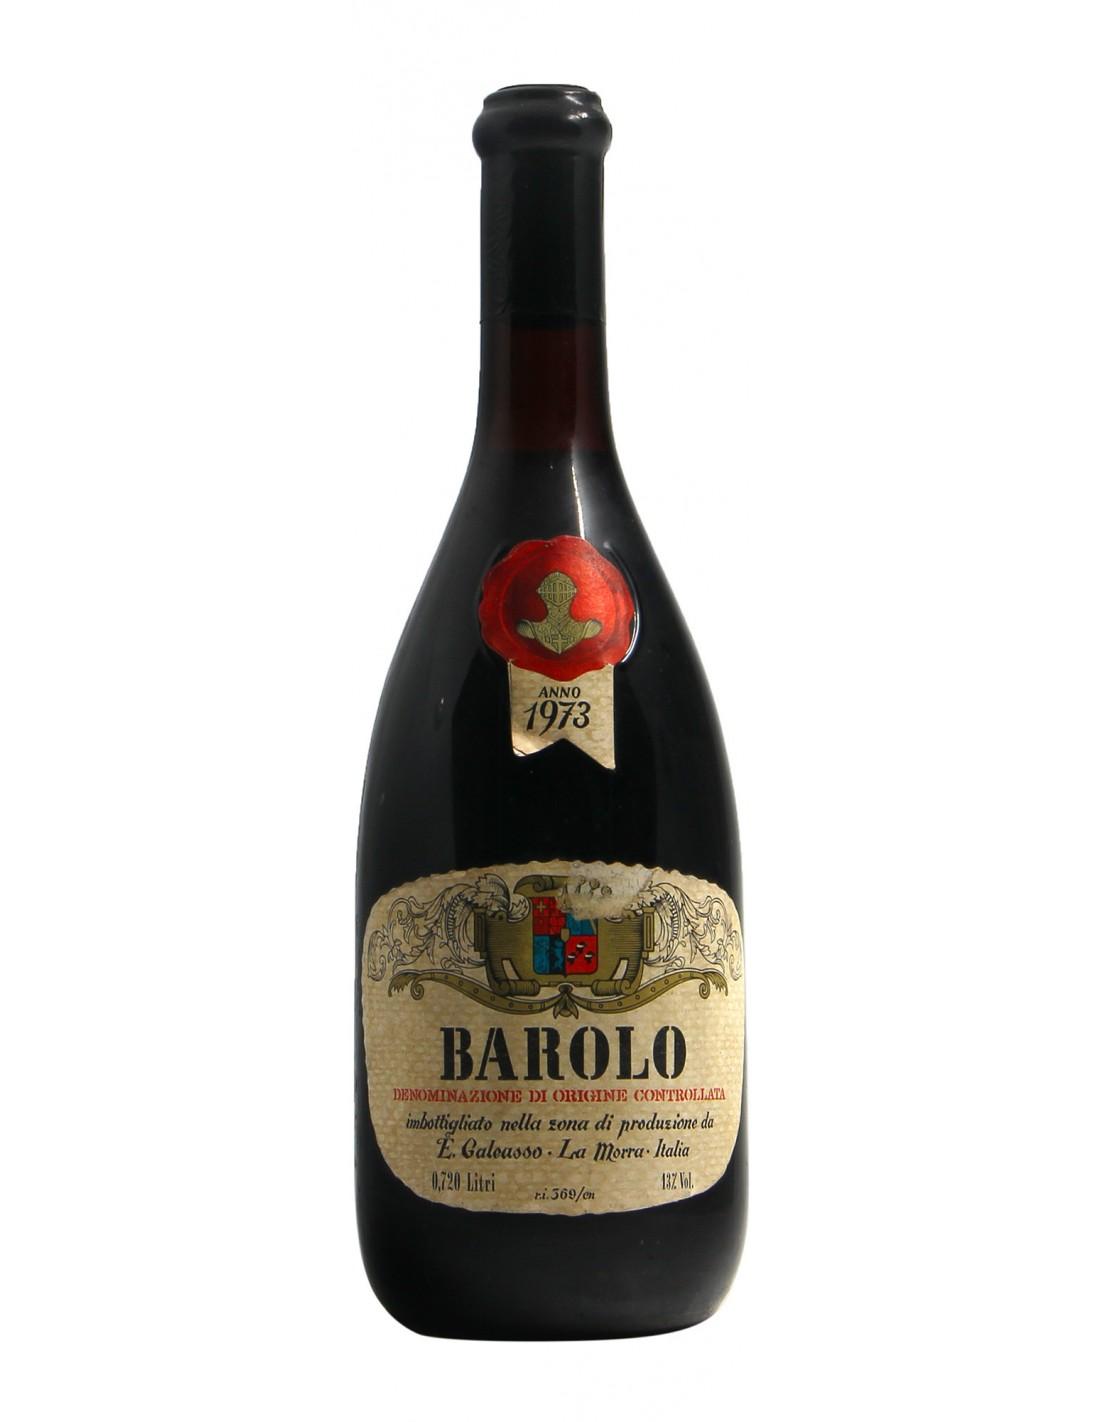 BAROLO 1973 GALEASSO GRANDI BOTTIGLIE